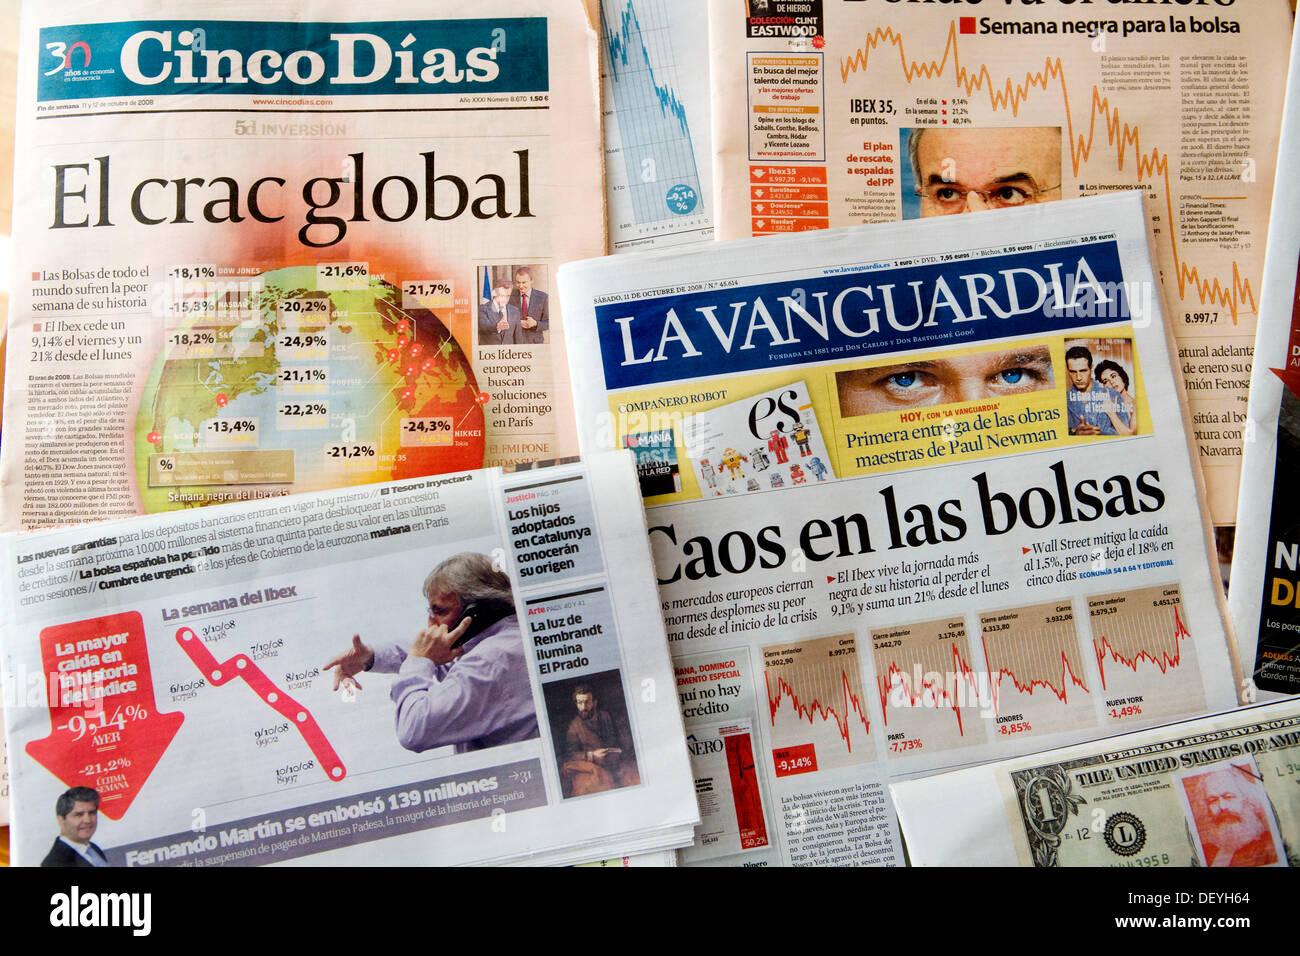 2008 global economy crash as seen through the Spanish newspapers - Stock Image